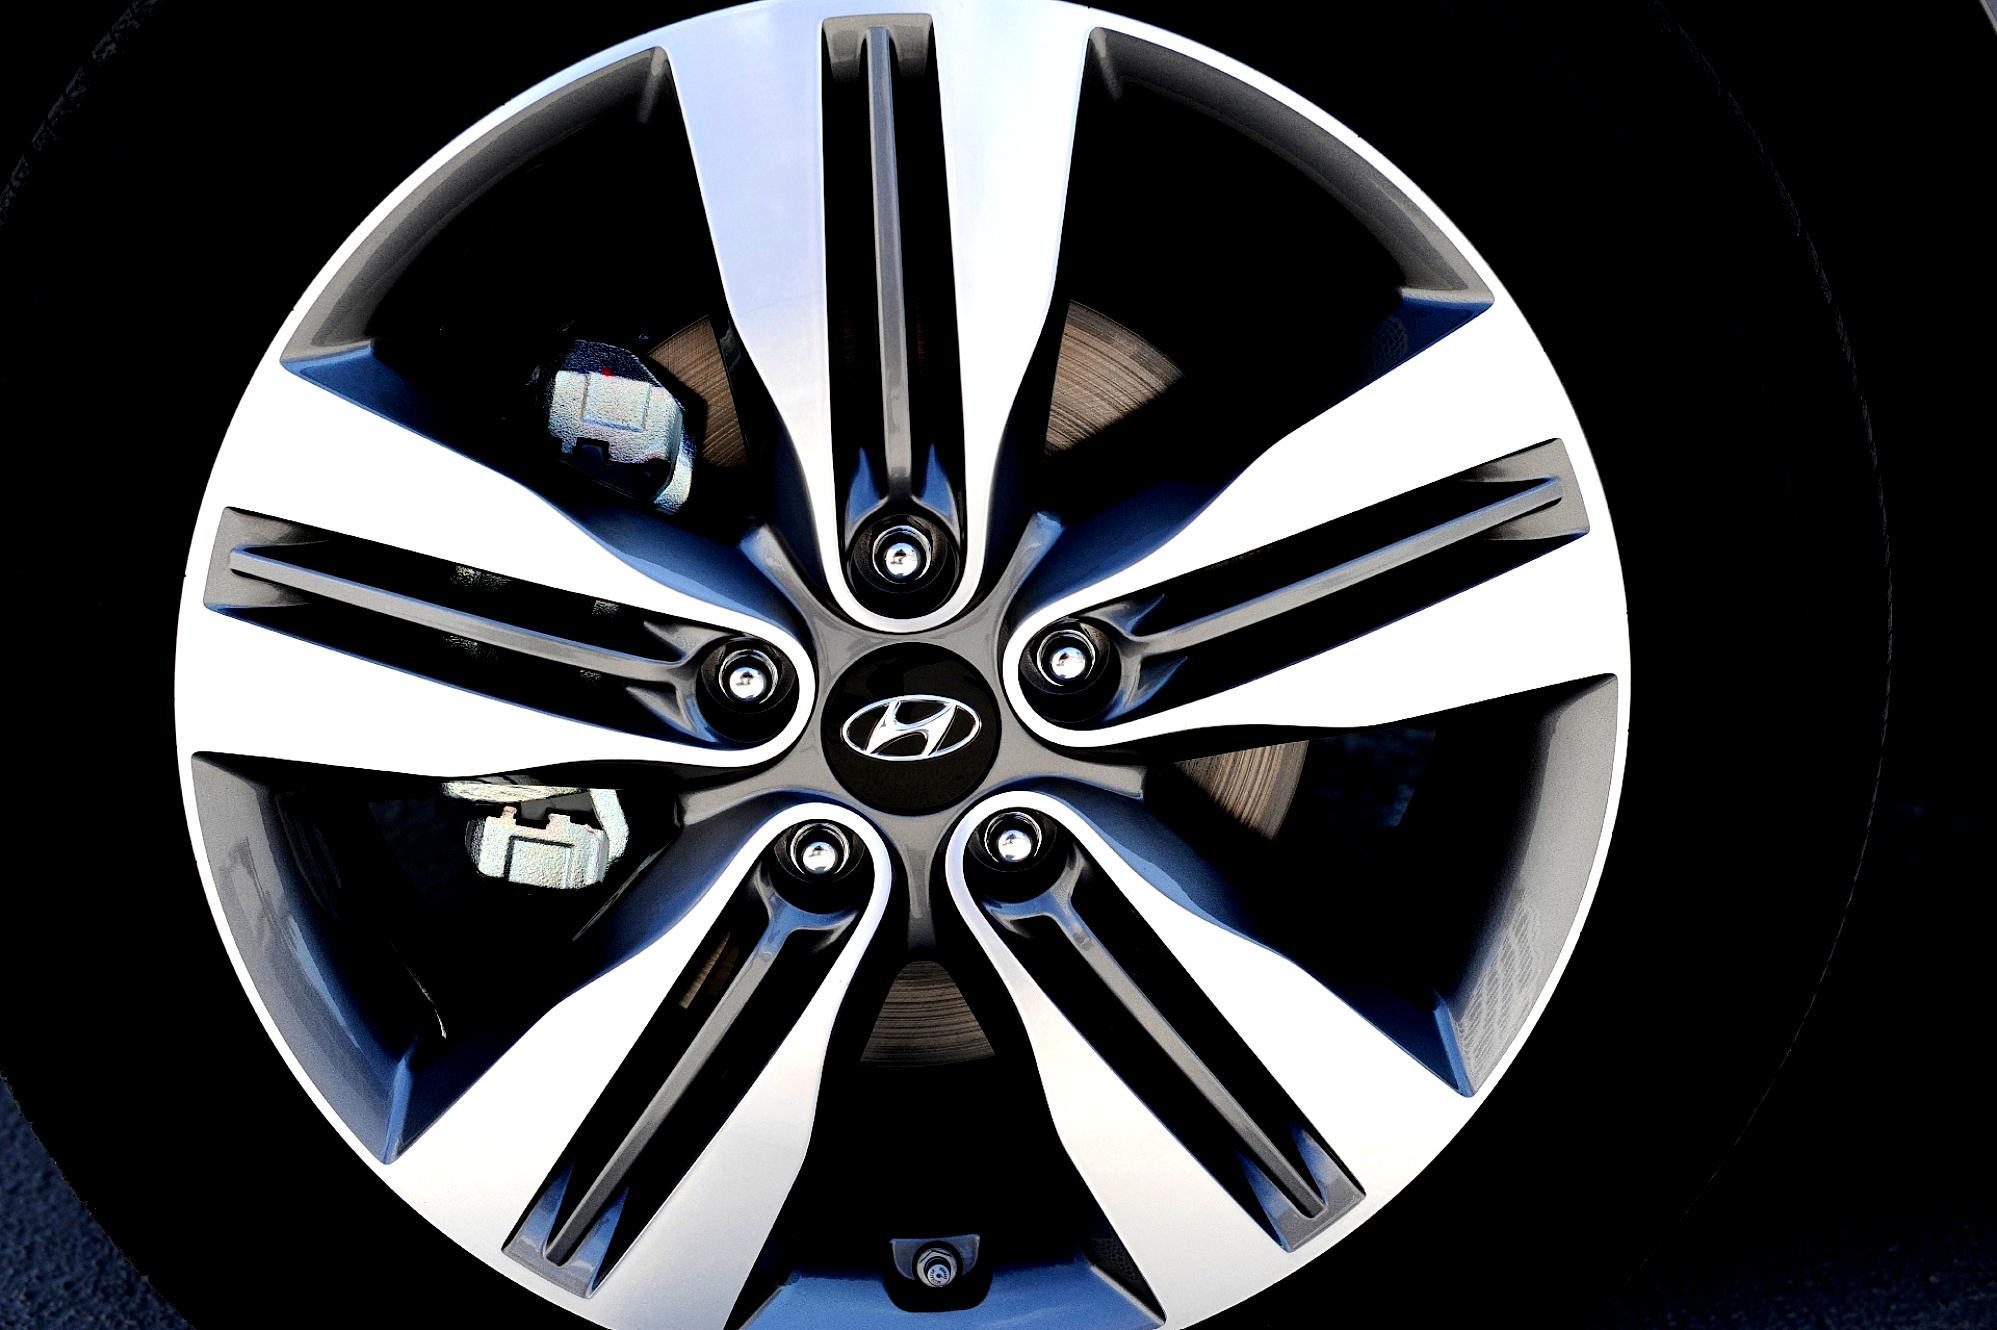 Hyundai Ix35 Tucson 2013 Photos 11 On Motoimg Com